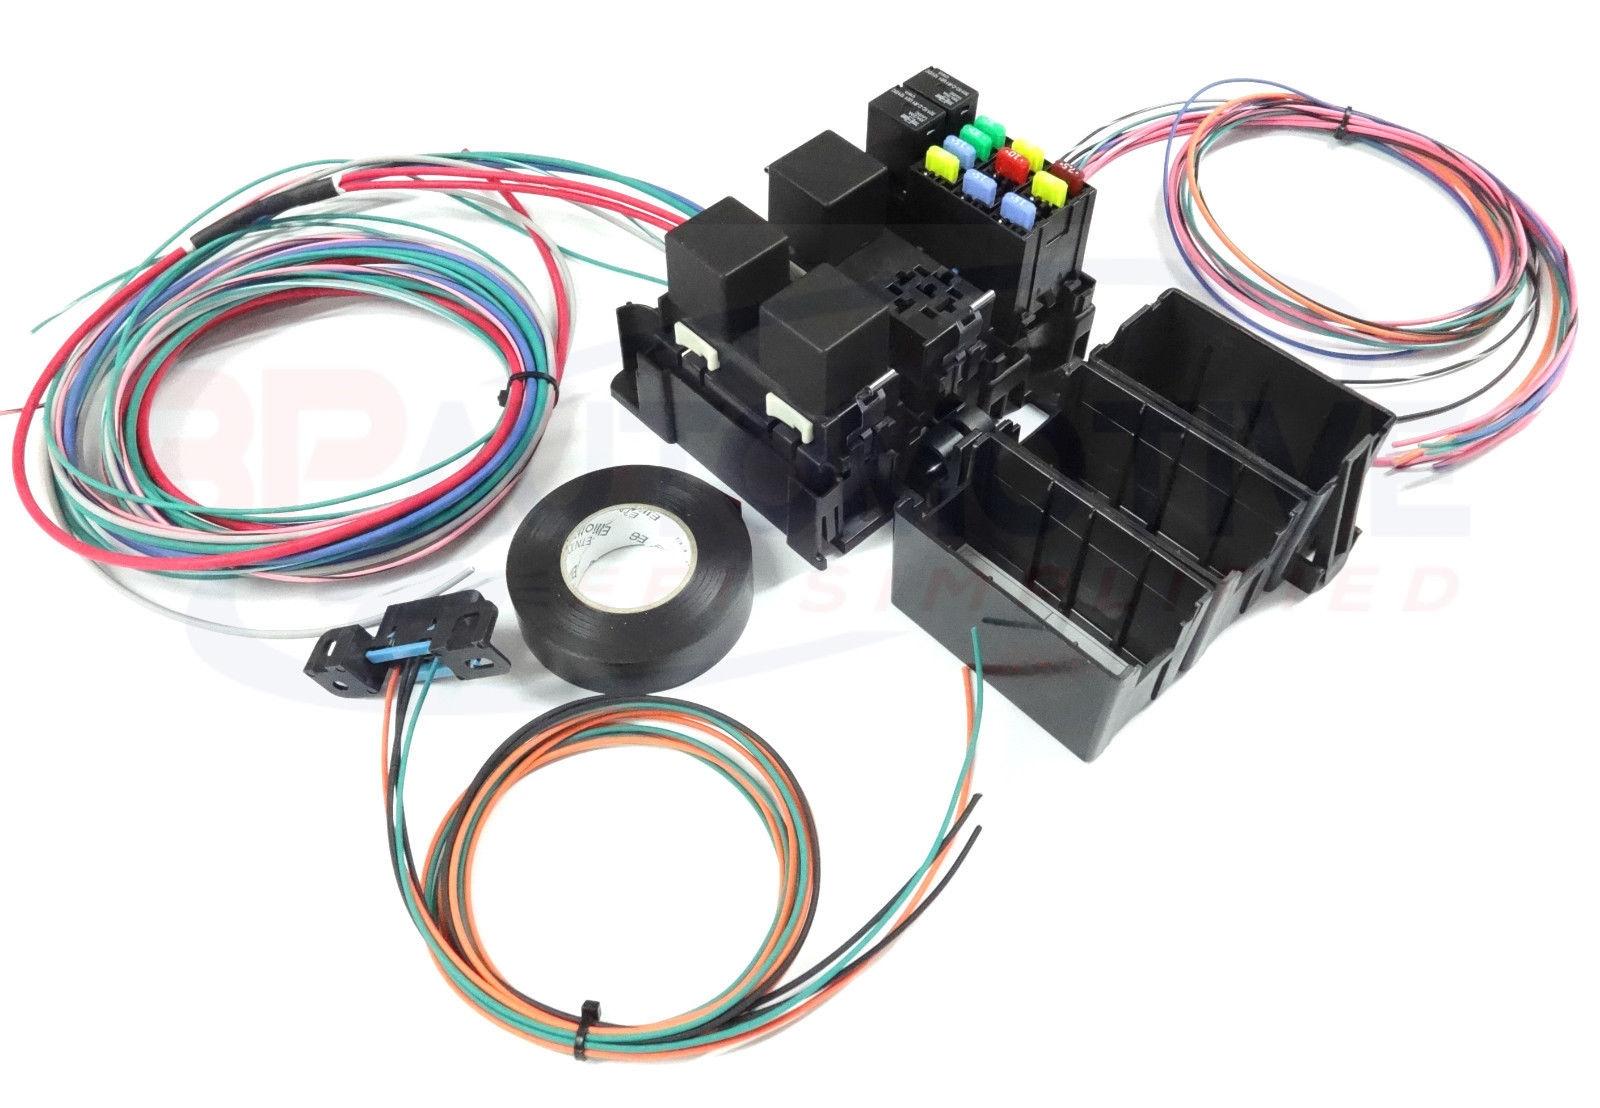 Chevy 6 5 Ecm Wiring Diagram Ls Swap Diy Harness Rework Fuse Block Kit For Ls